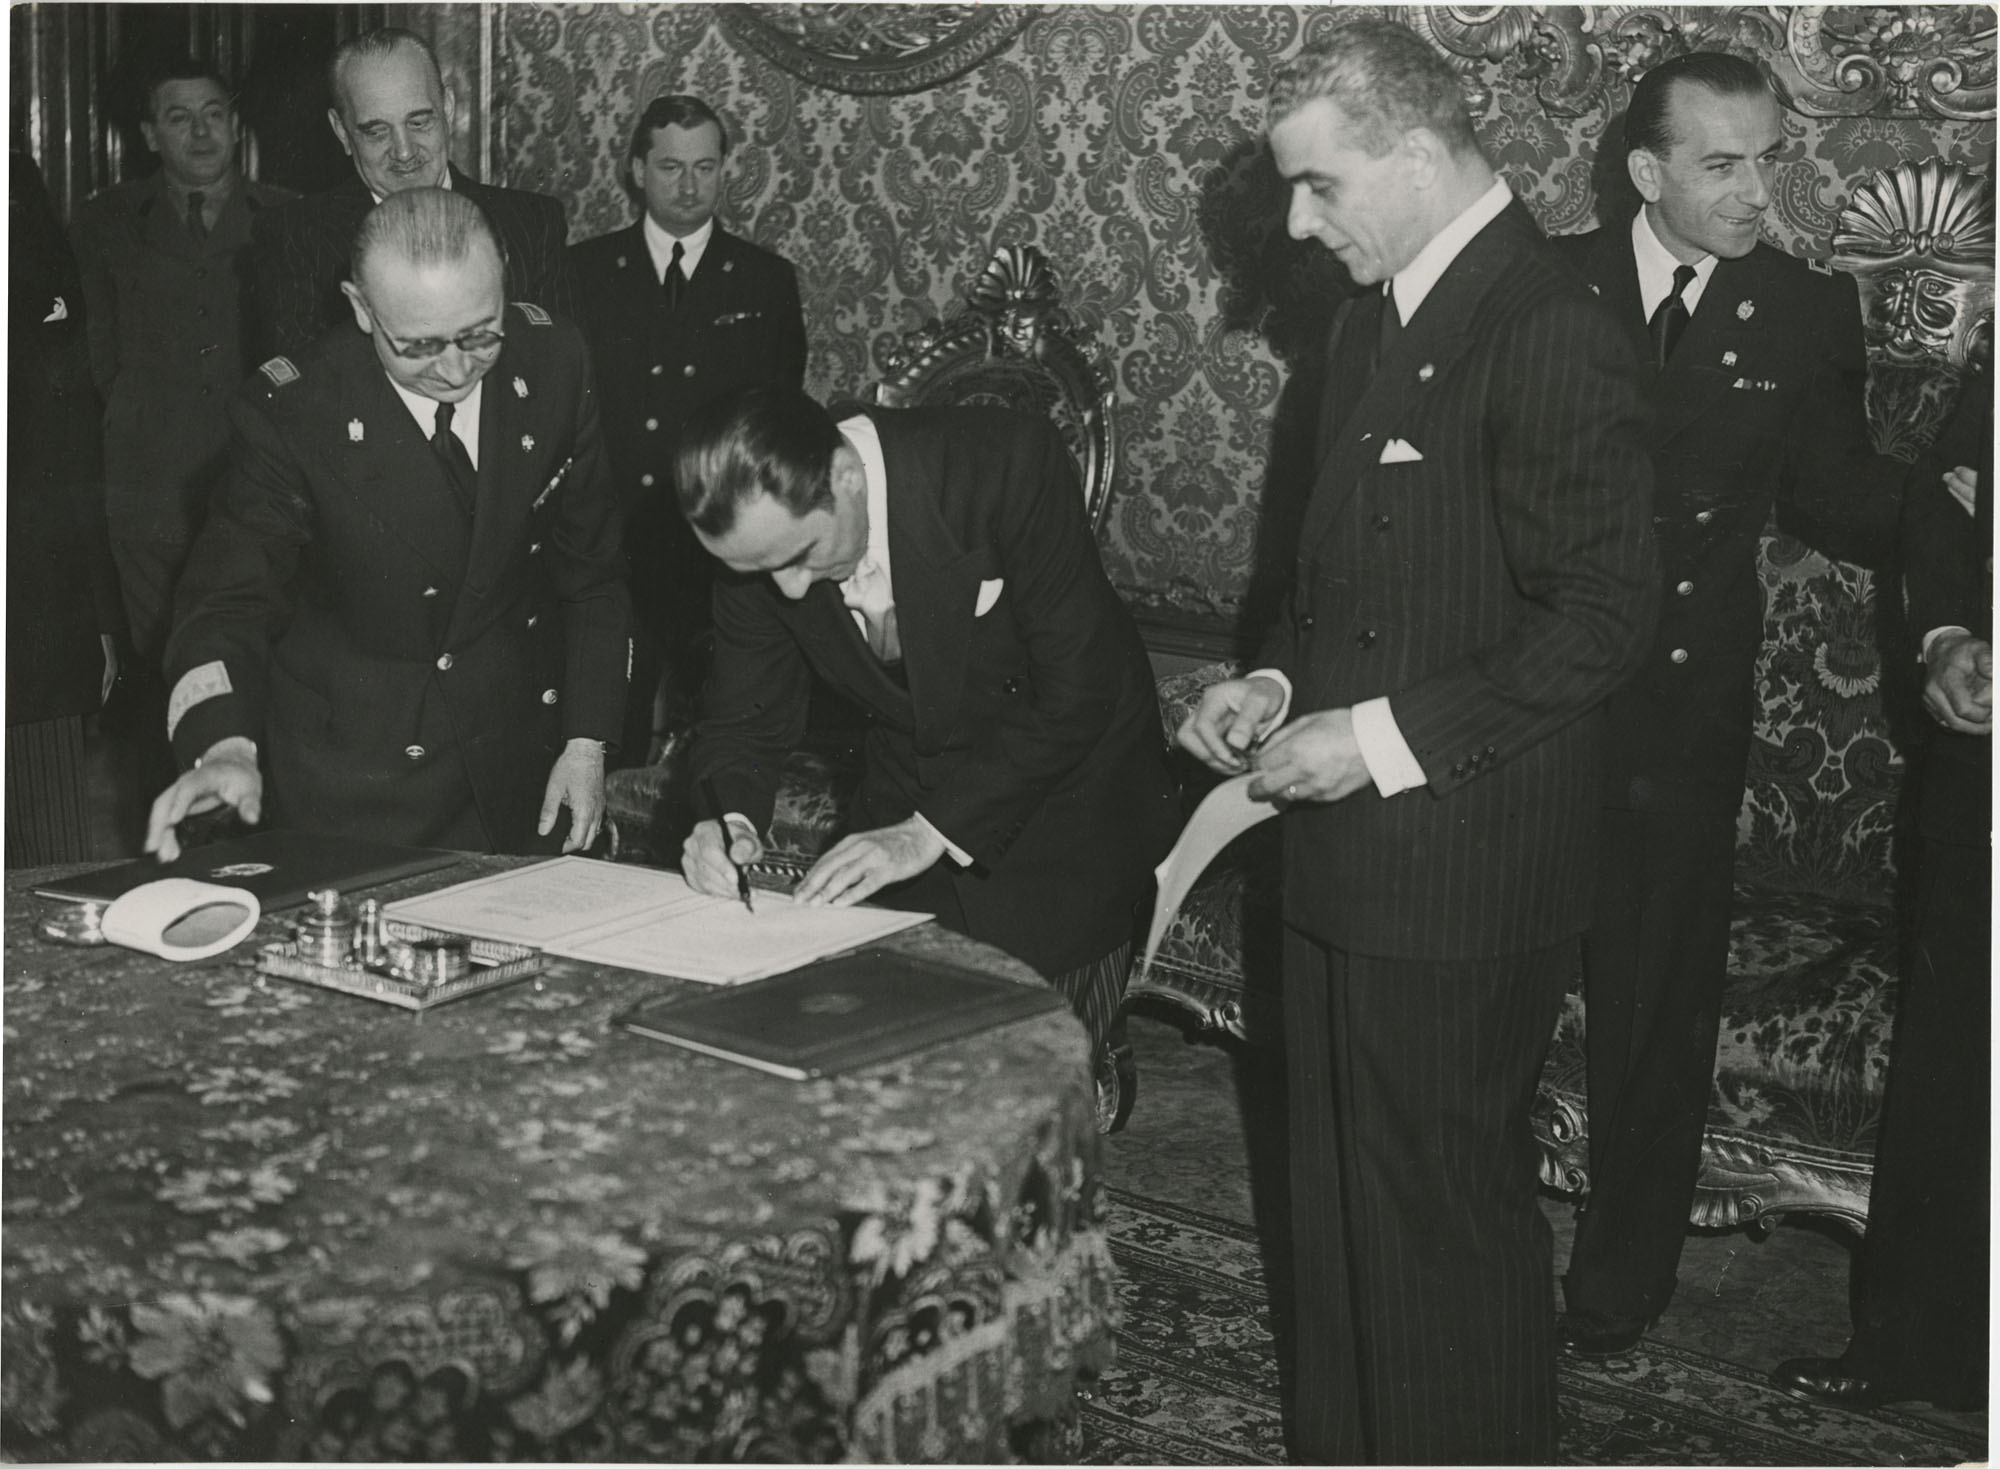 Mihai Antonescu's visit to Benito Mussolini, Photograph 1